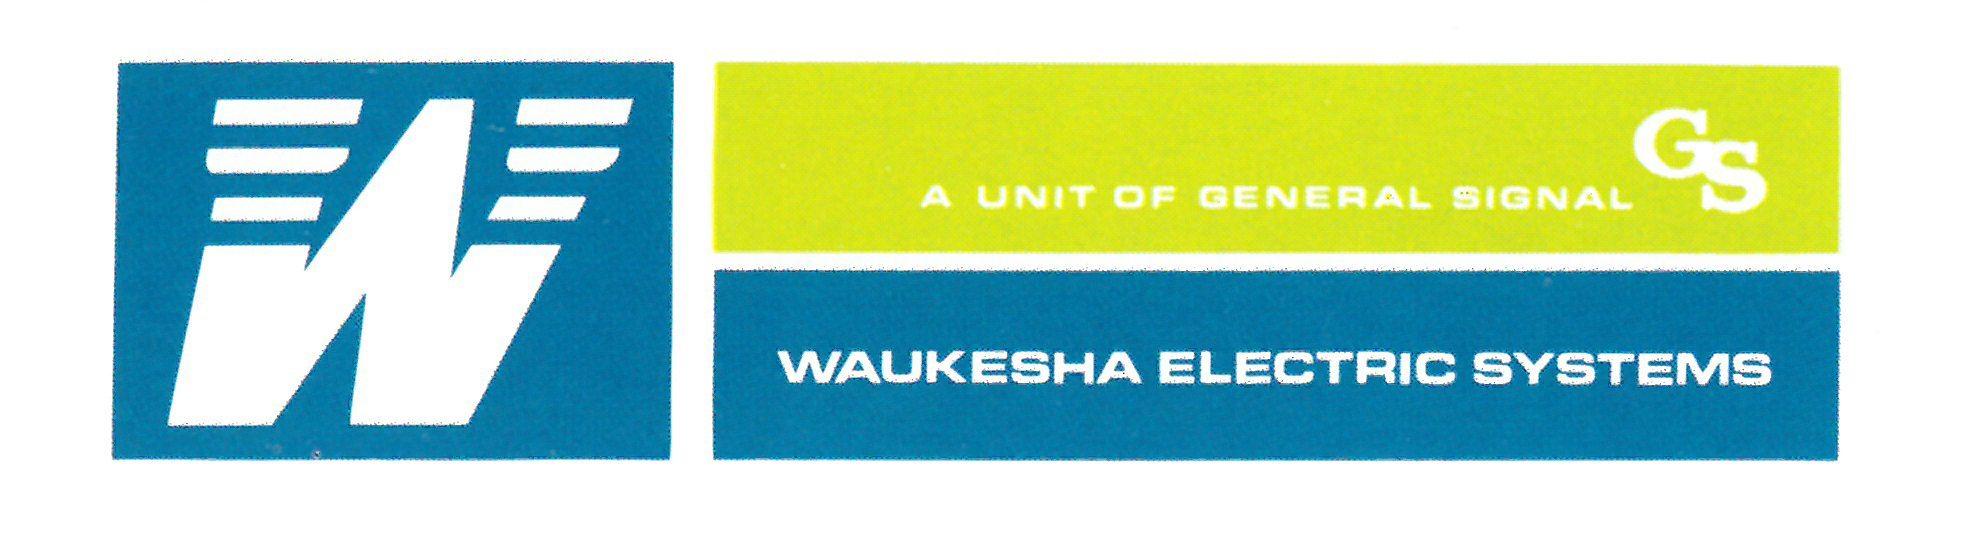 History Of SPX & Waukesha® | SPX Transformer Solutions, Inc